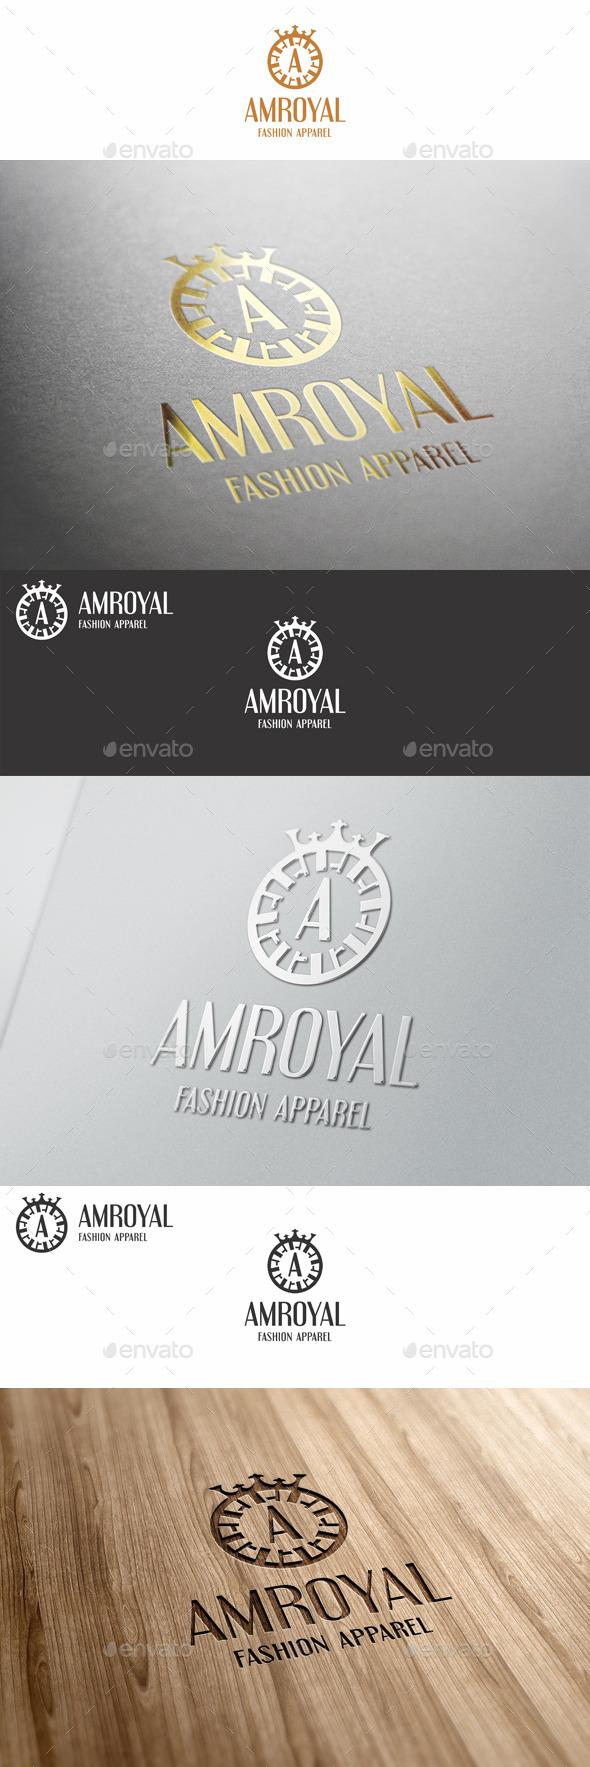 GraphicRiver A Letter Fashion Boutique Logo 11525736